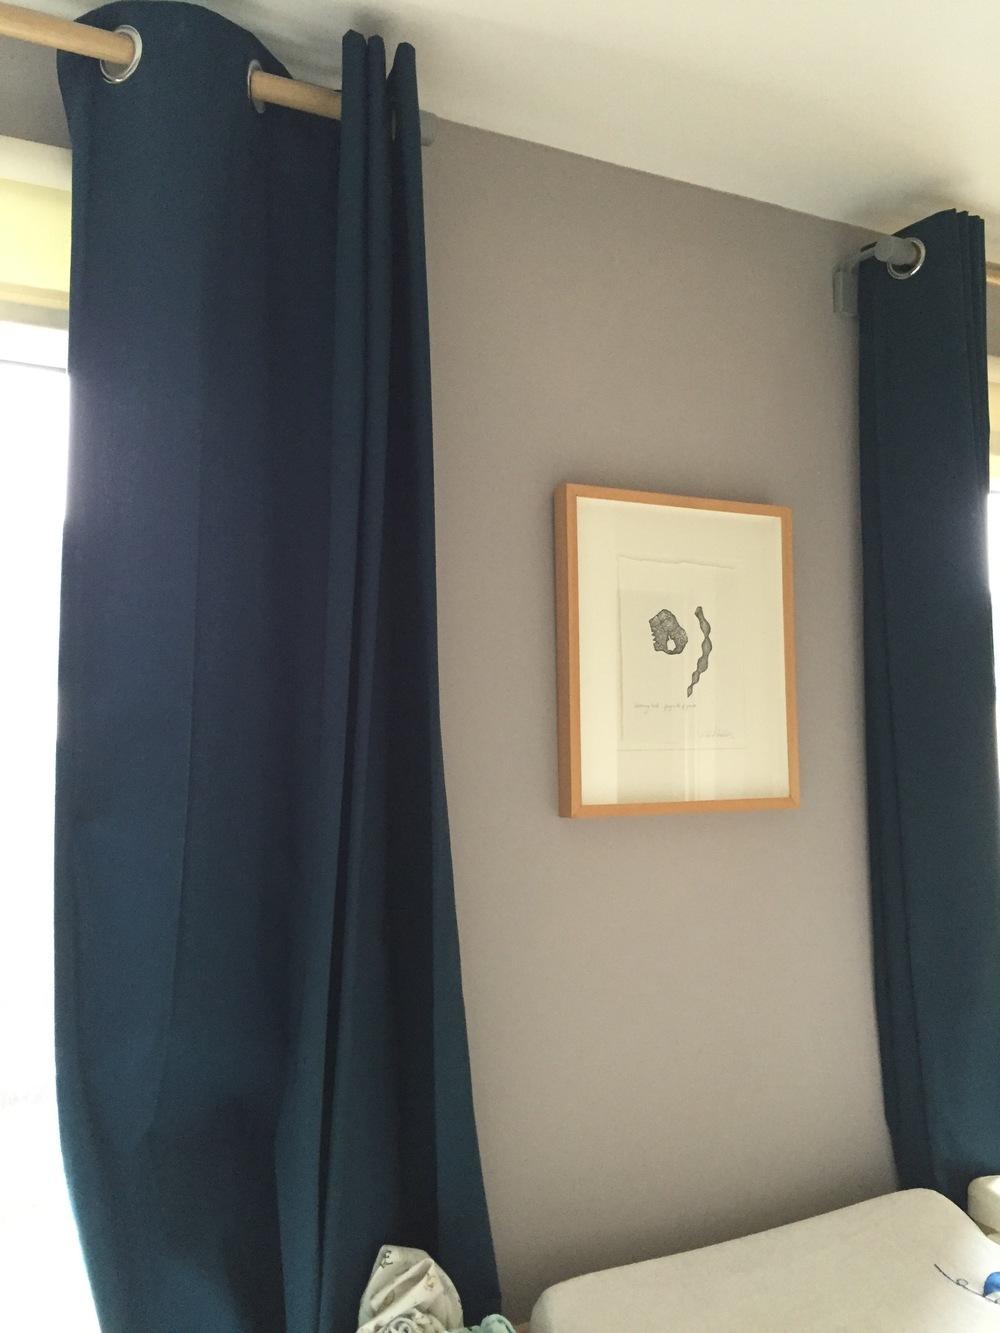 The original curtains